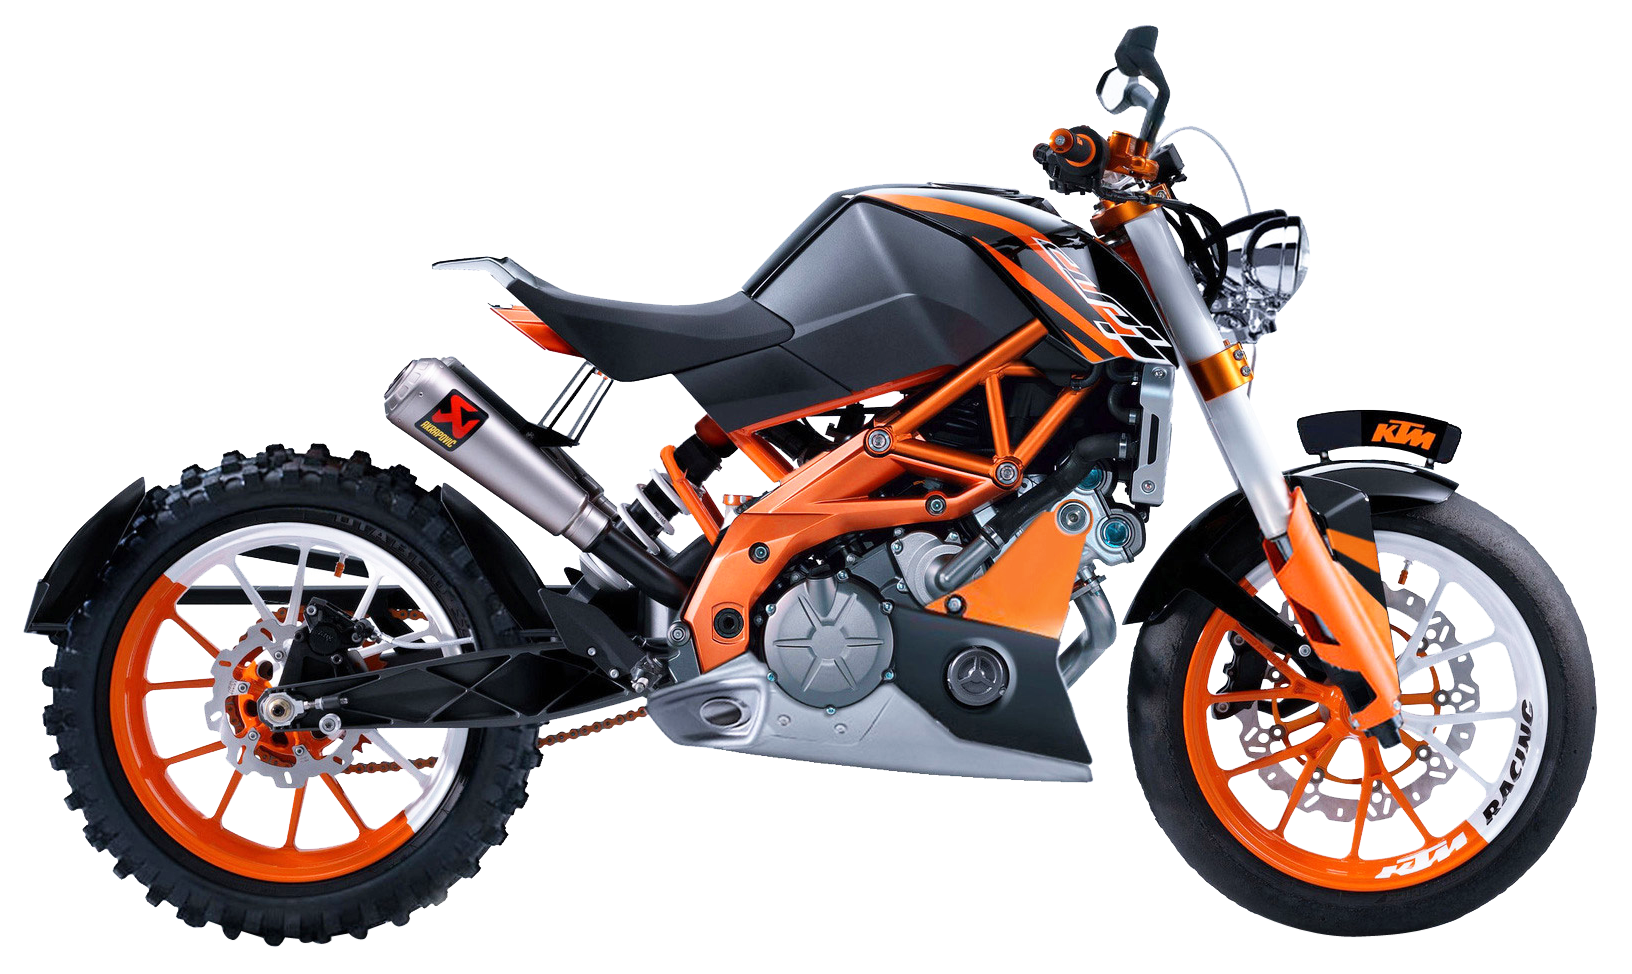 Motorbike HD PNG-PlusPNG Pluspng.com-1632 - Motorbike HD PNG - PNG HD Bike